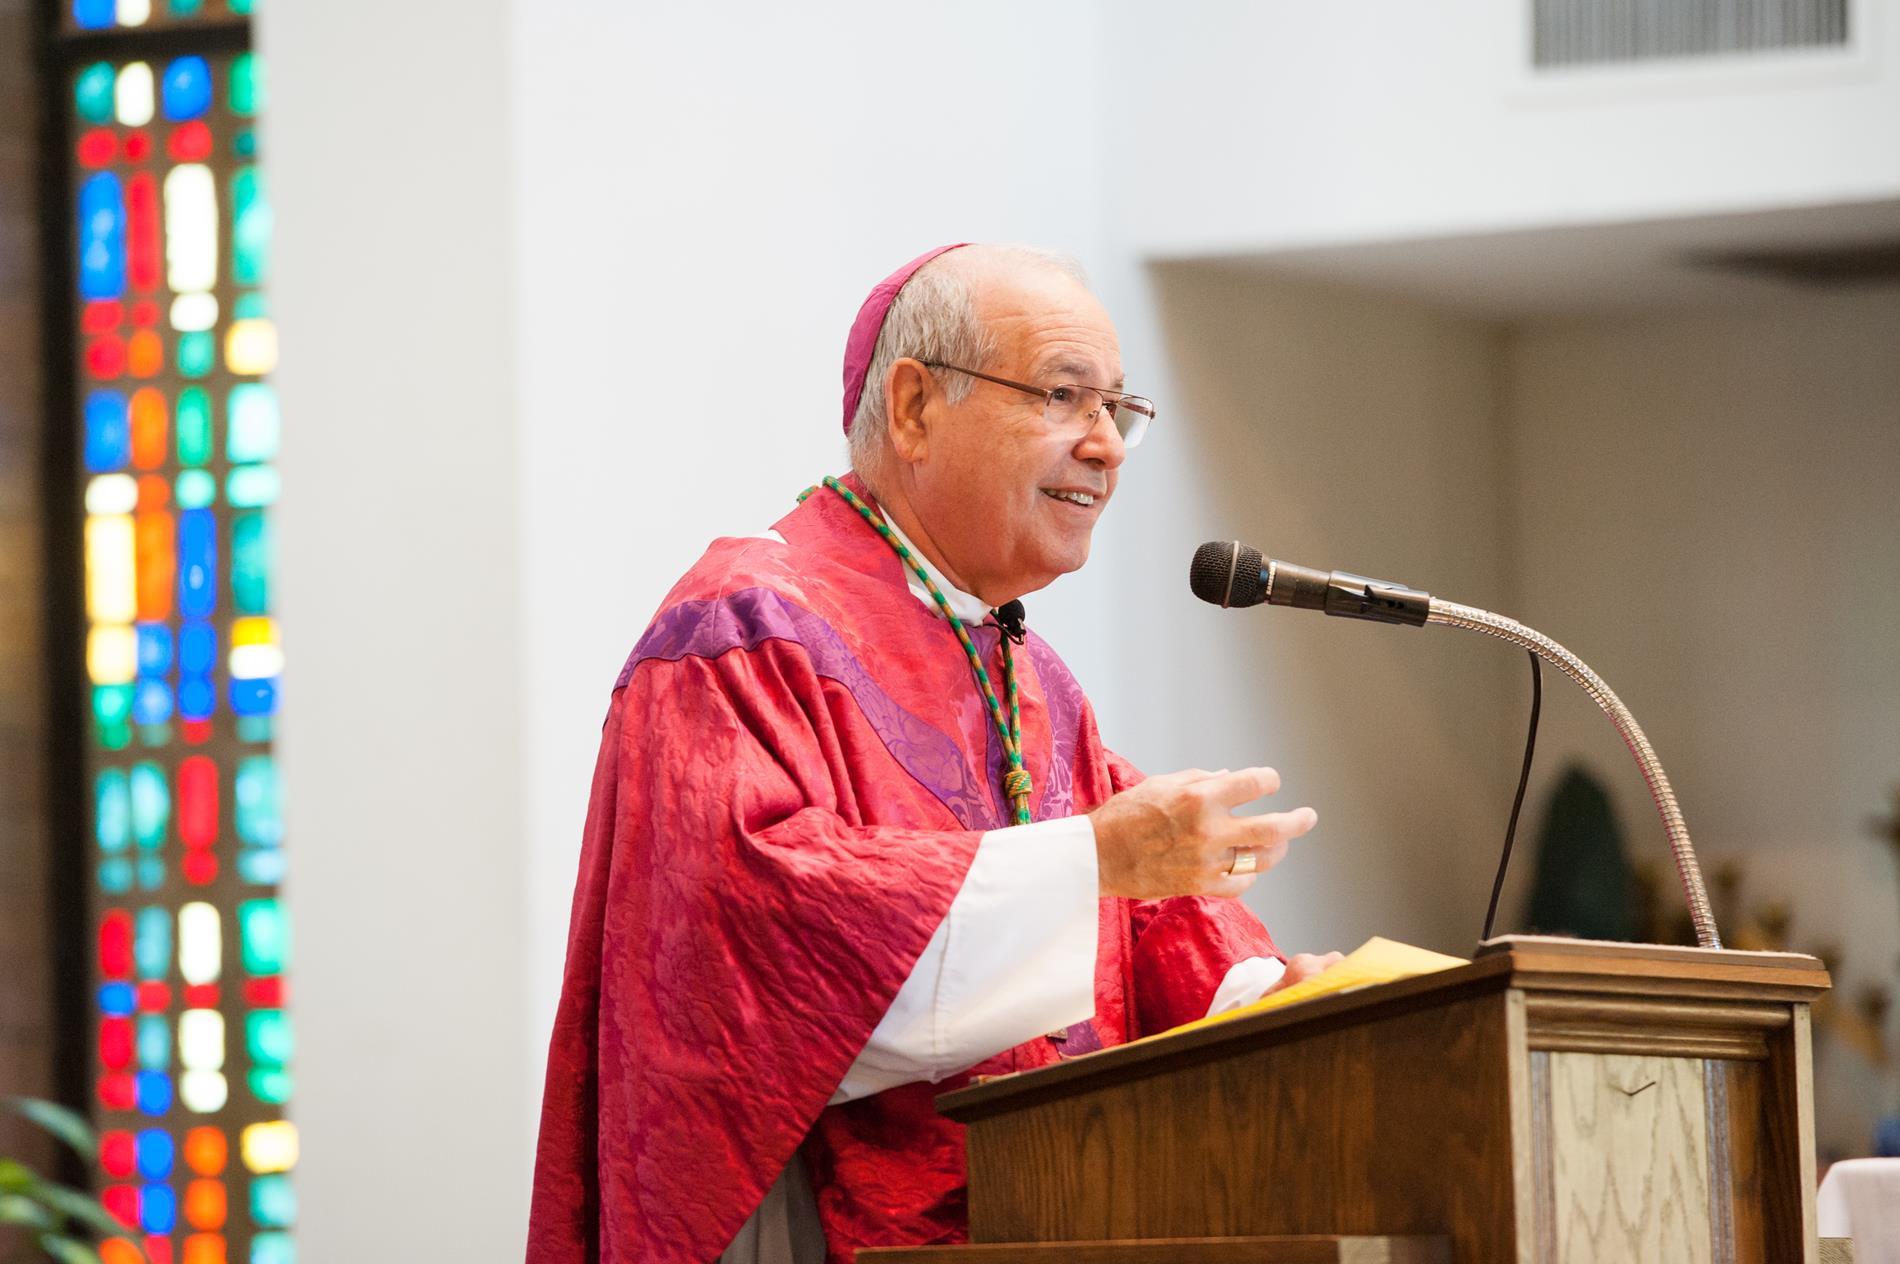 Bishop Estevez